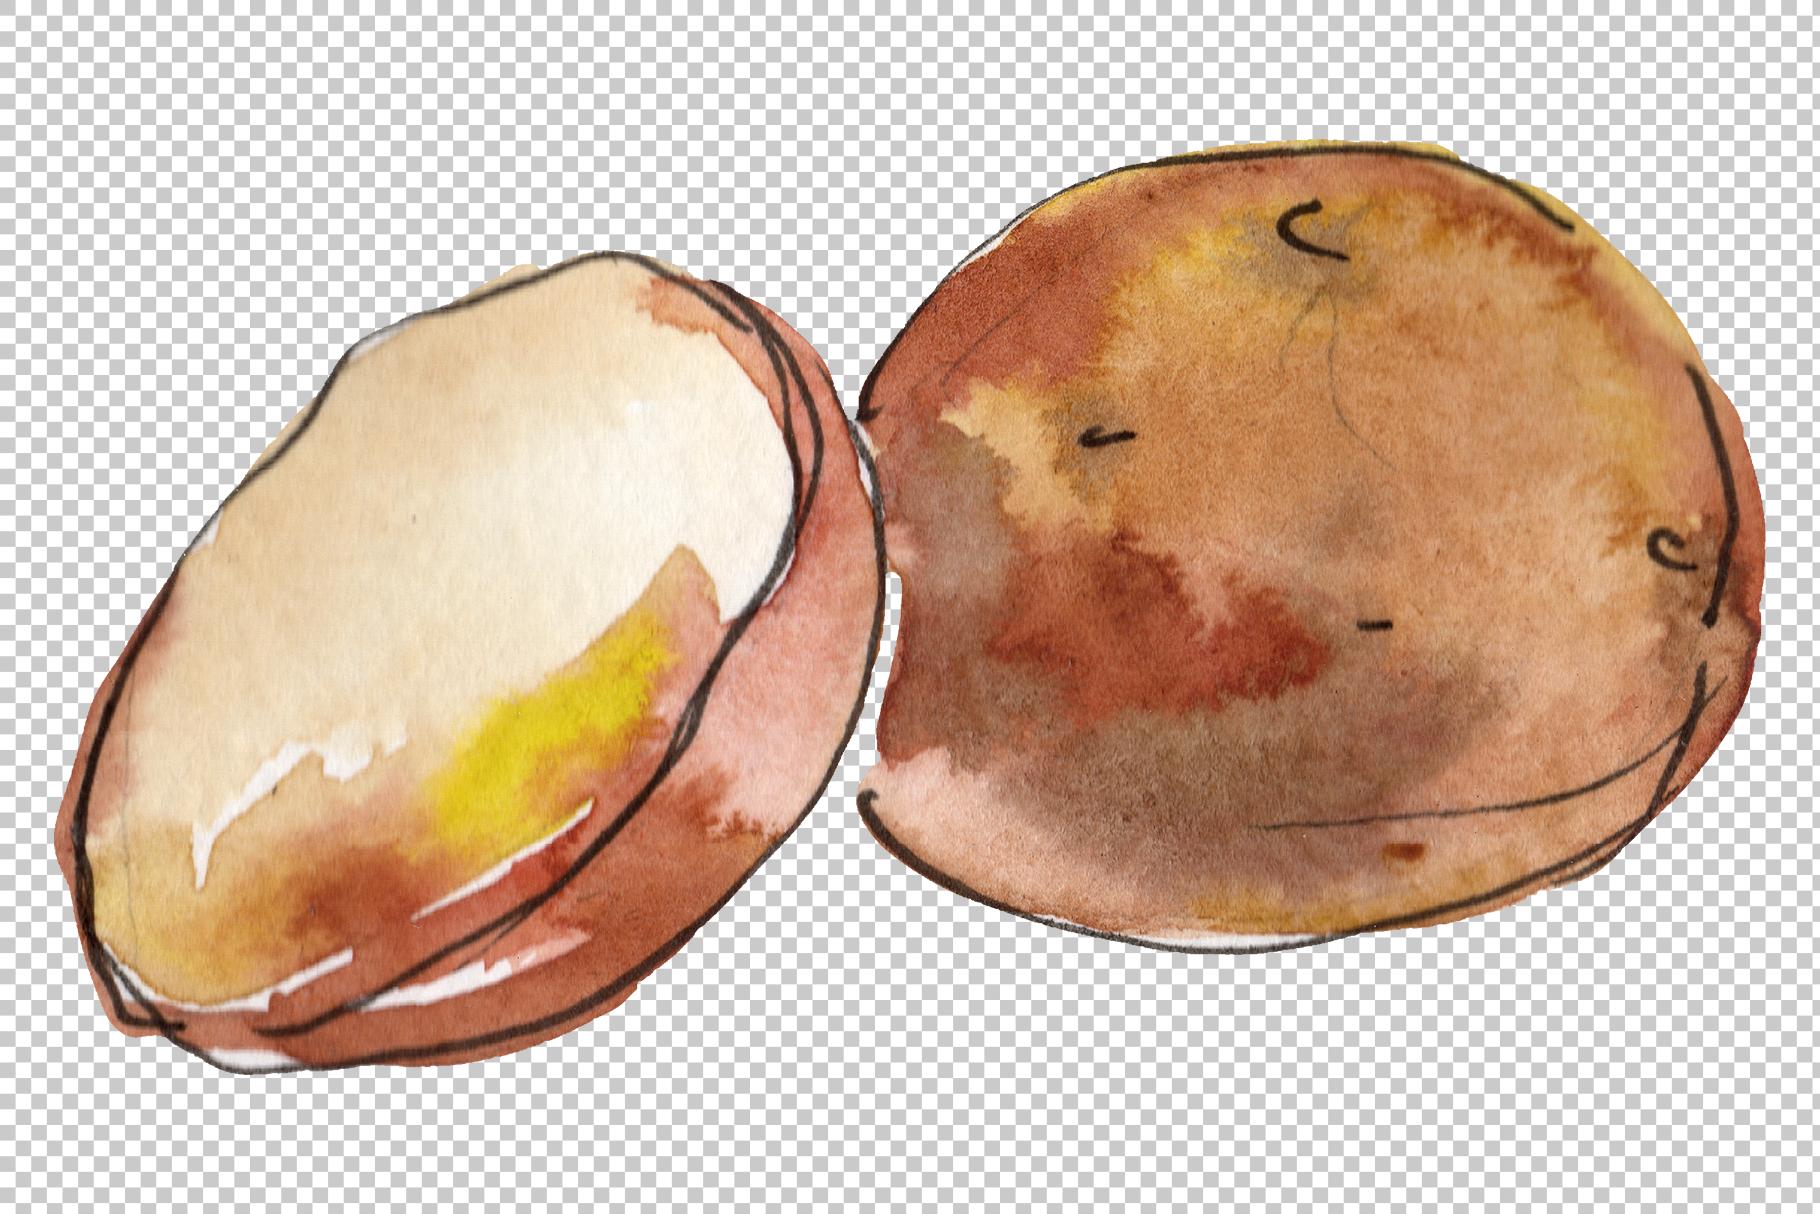 Steak Watercolor png example image 3